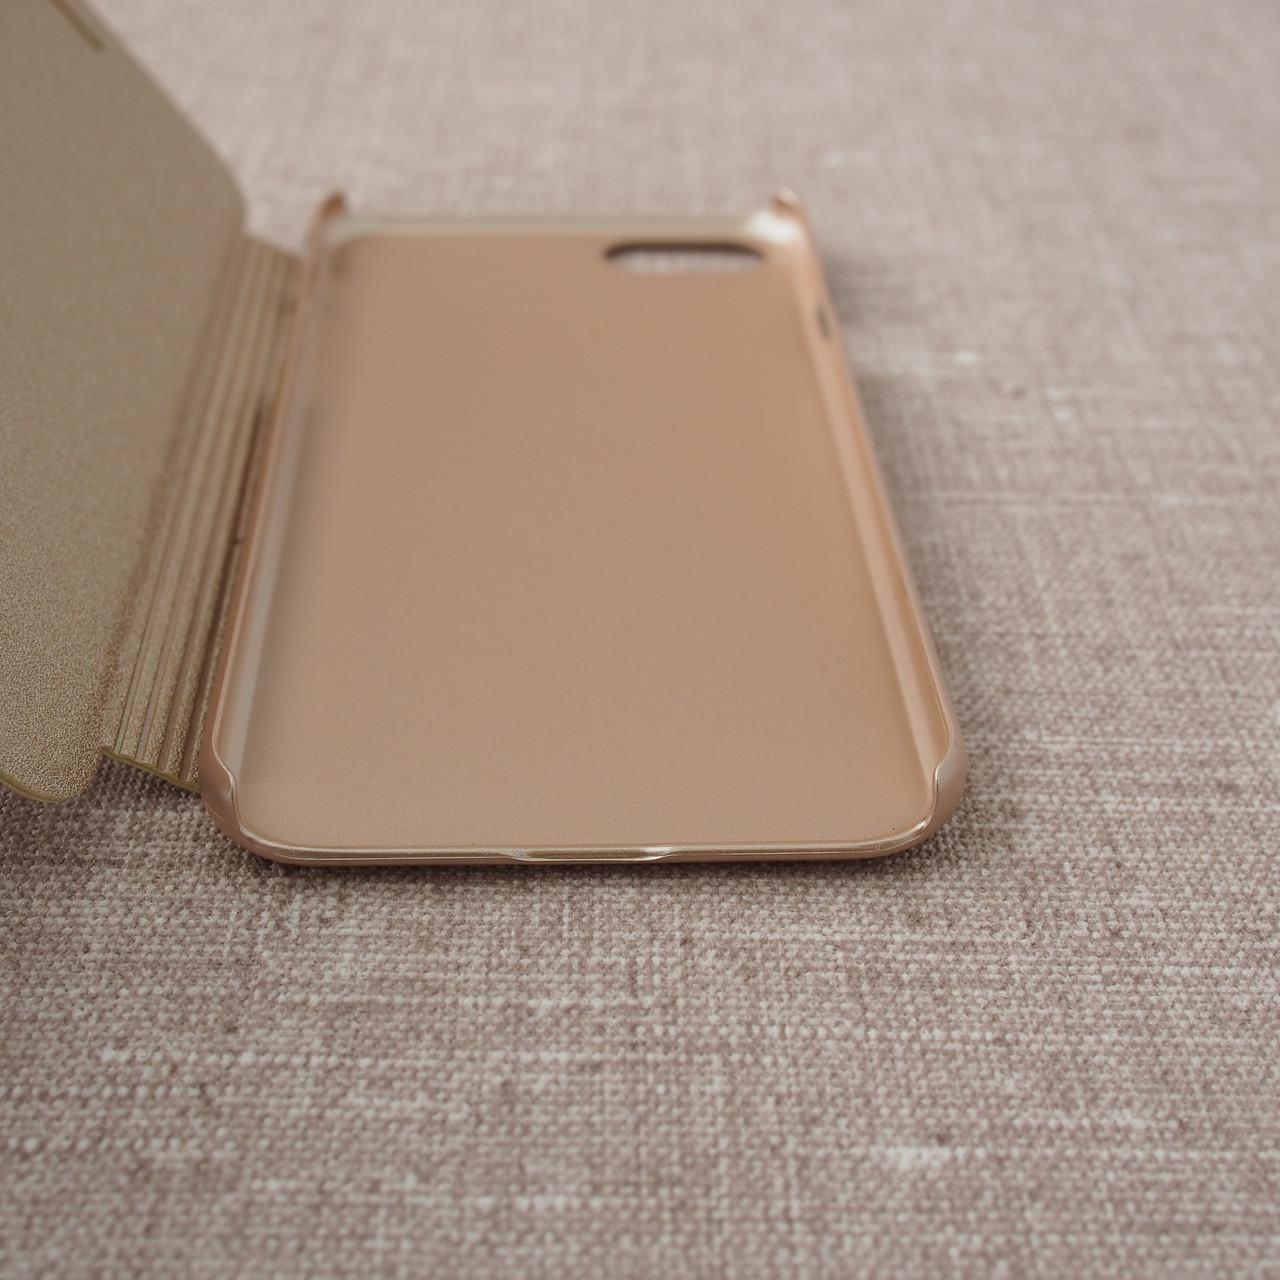 Nillkin Sparkle iPhone 7 gold Для телефона